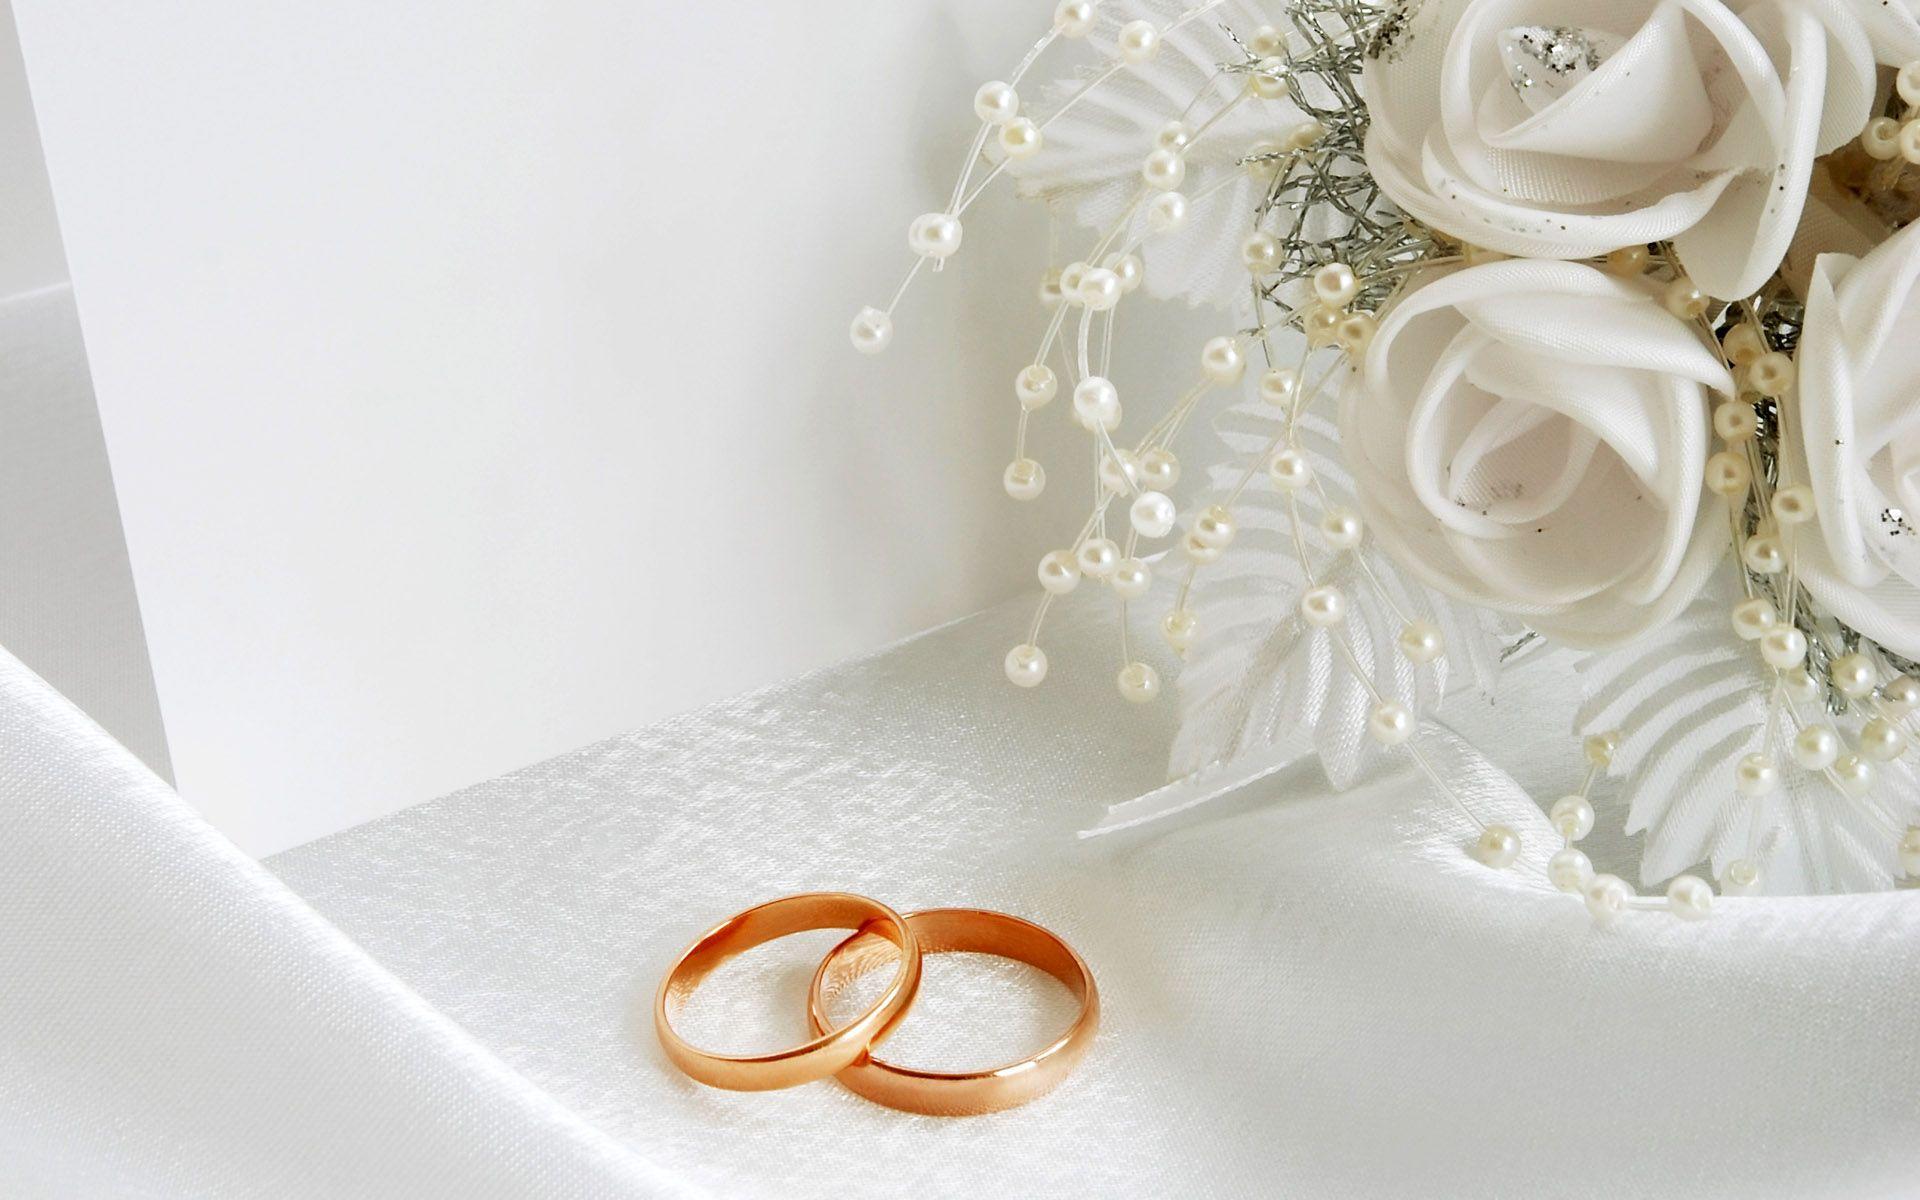 Wedding Design Wallpapers - Top Free Wedding Design Backgrounds